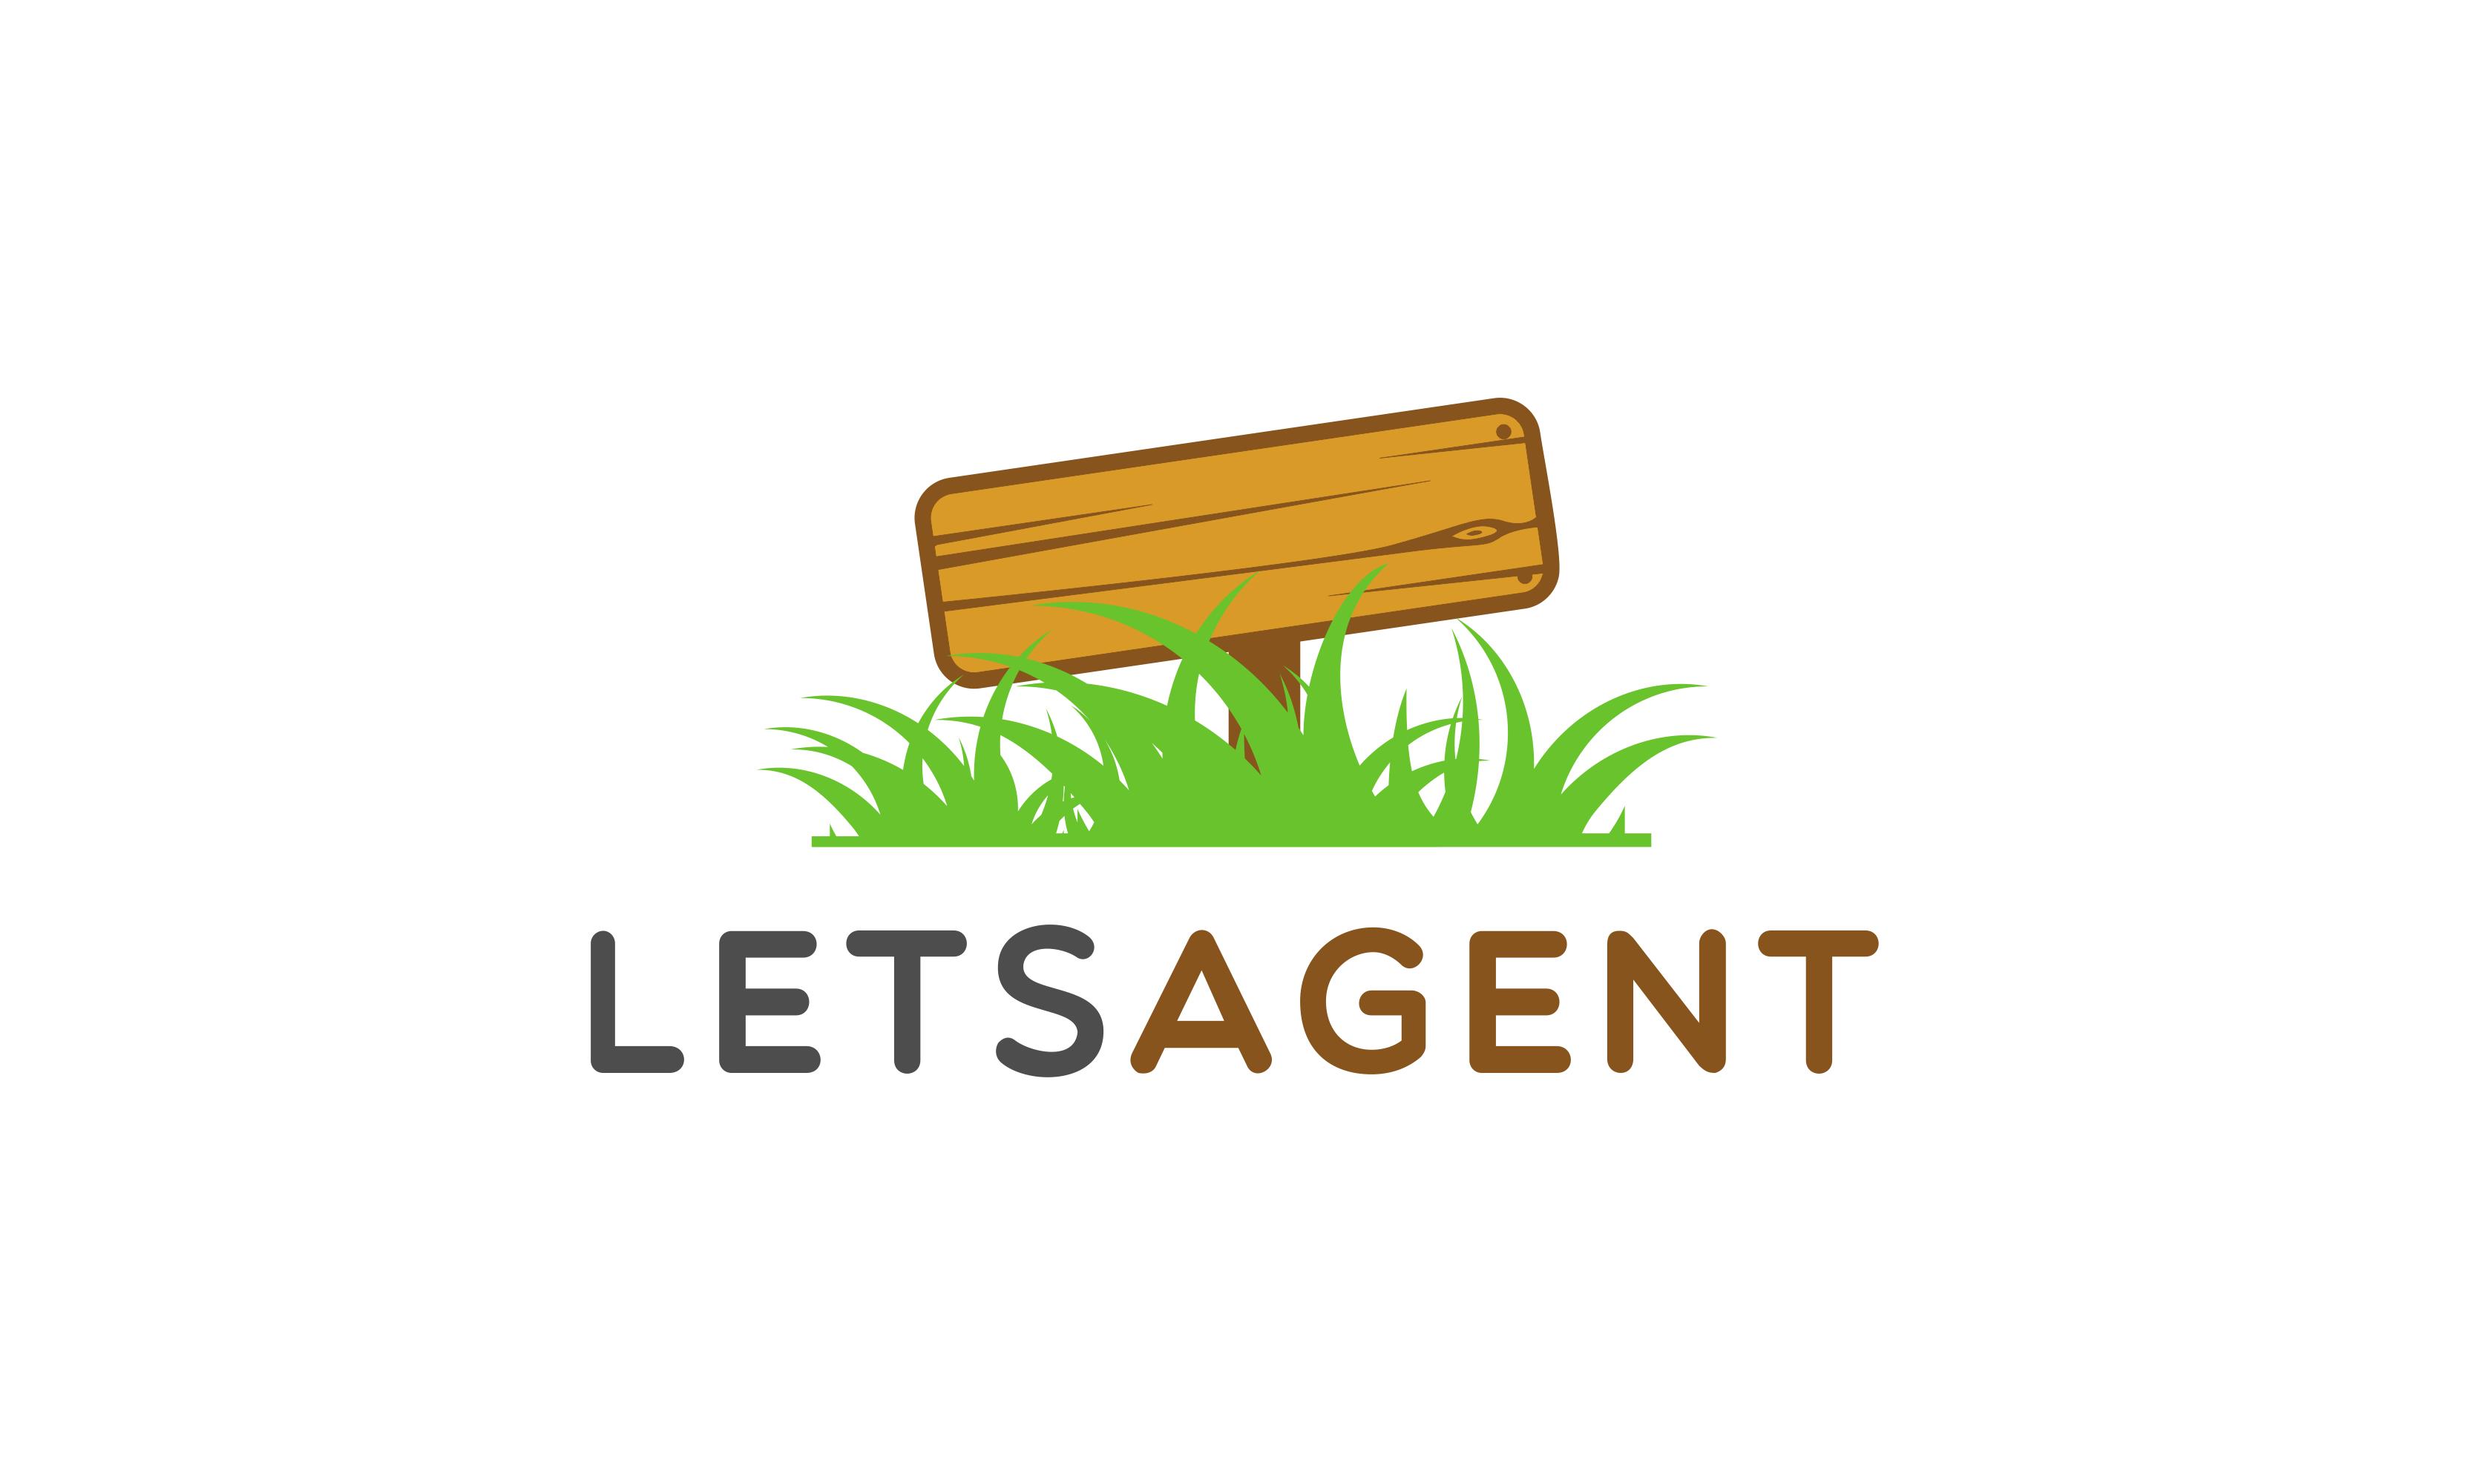 Letsagent